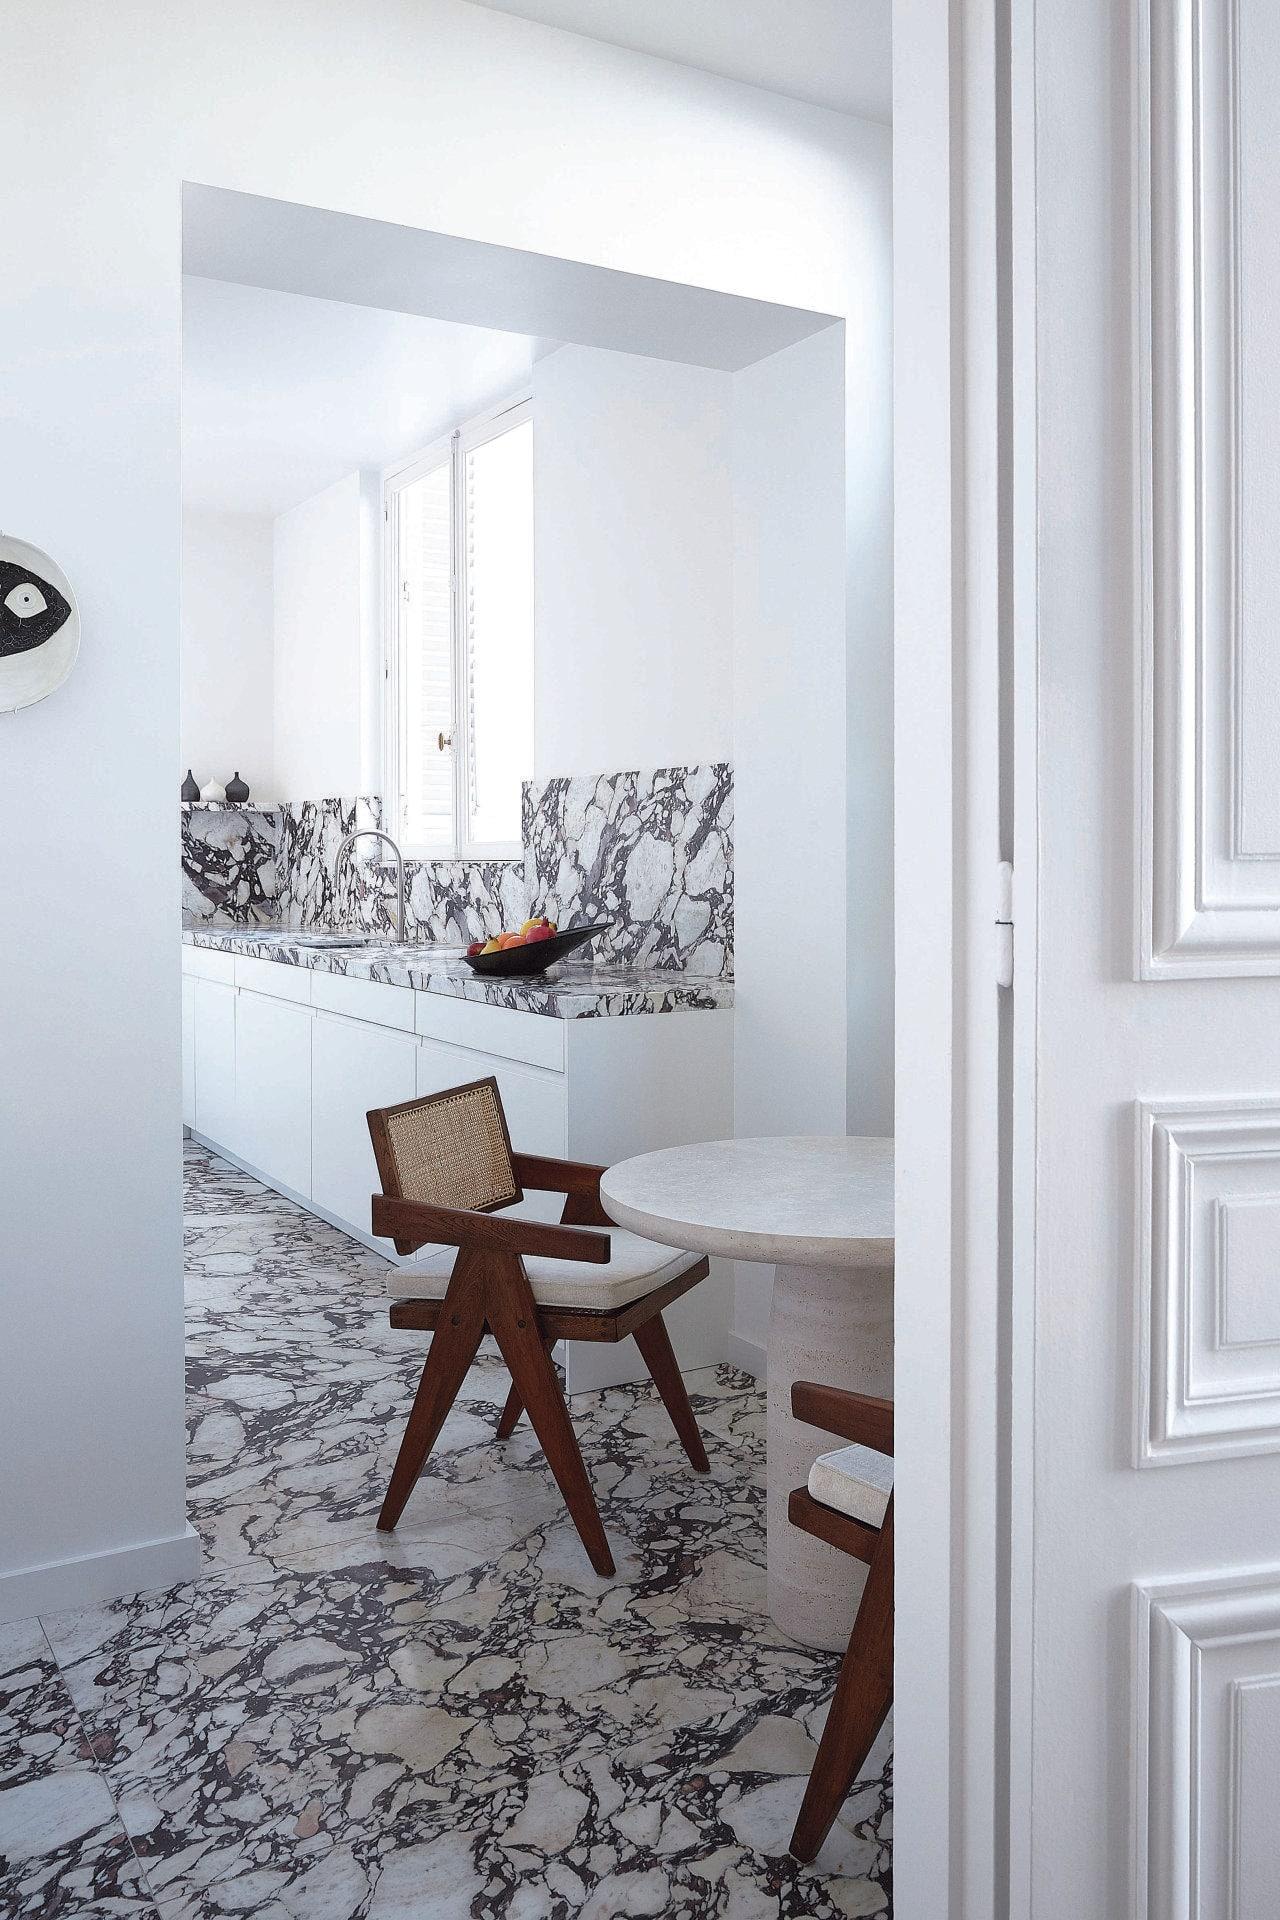 Décor Inspiration | At Home With: Emmanuel de Bayser, Paris